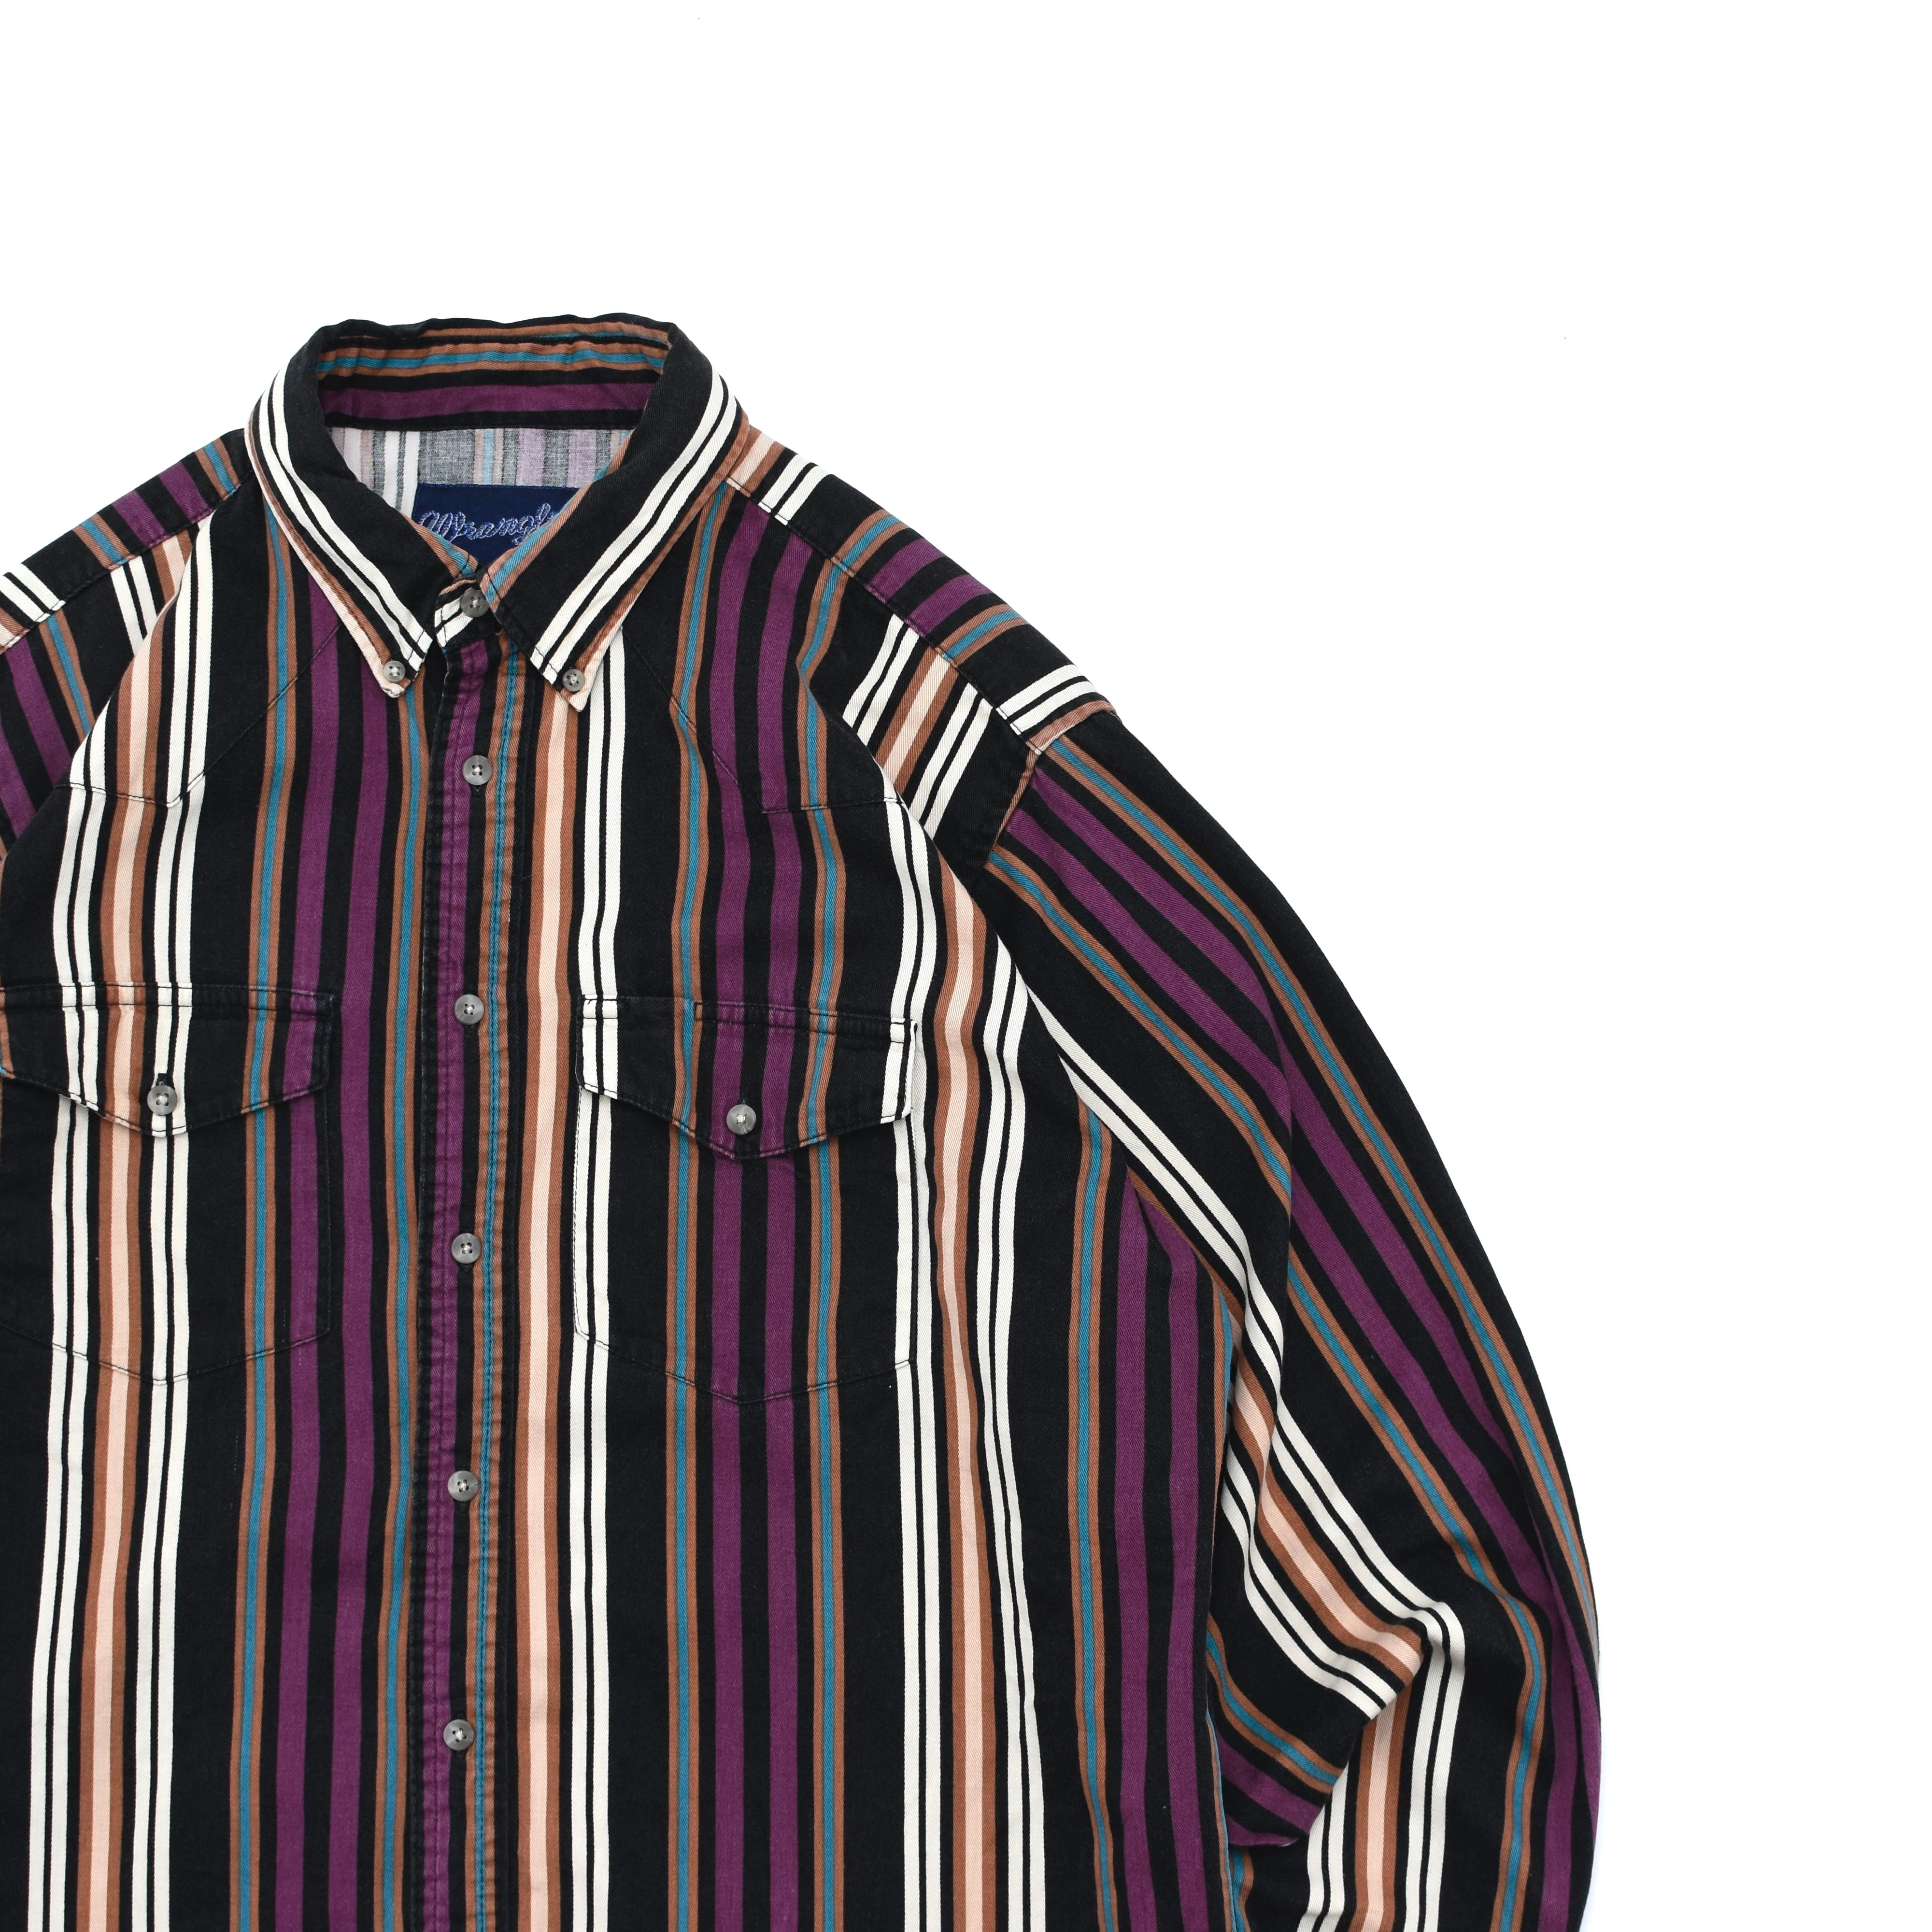 90's Boys size Wrangler stripe western shirt